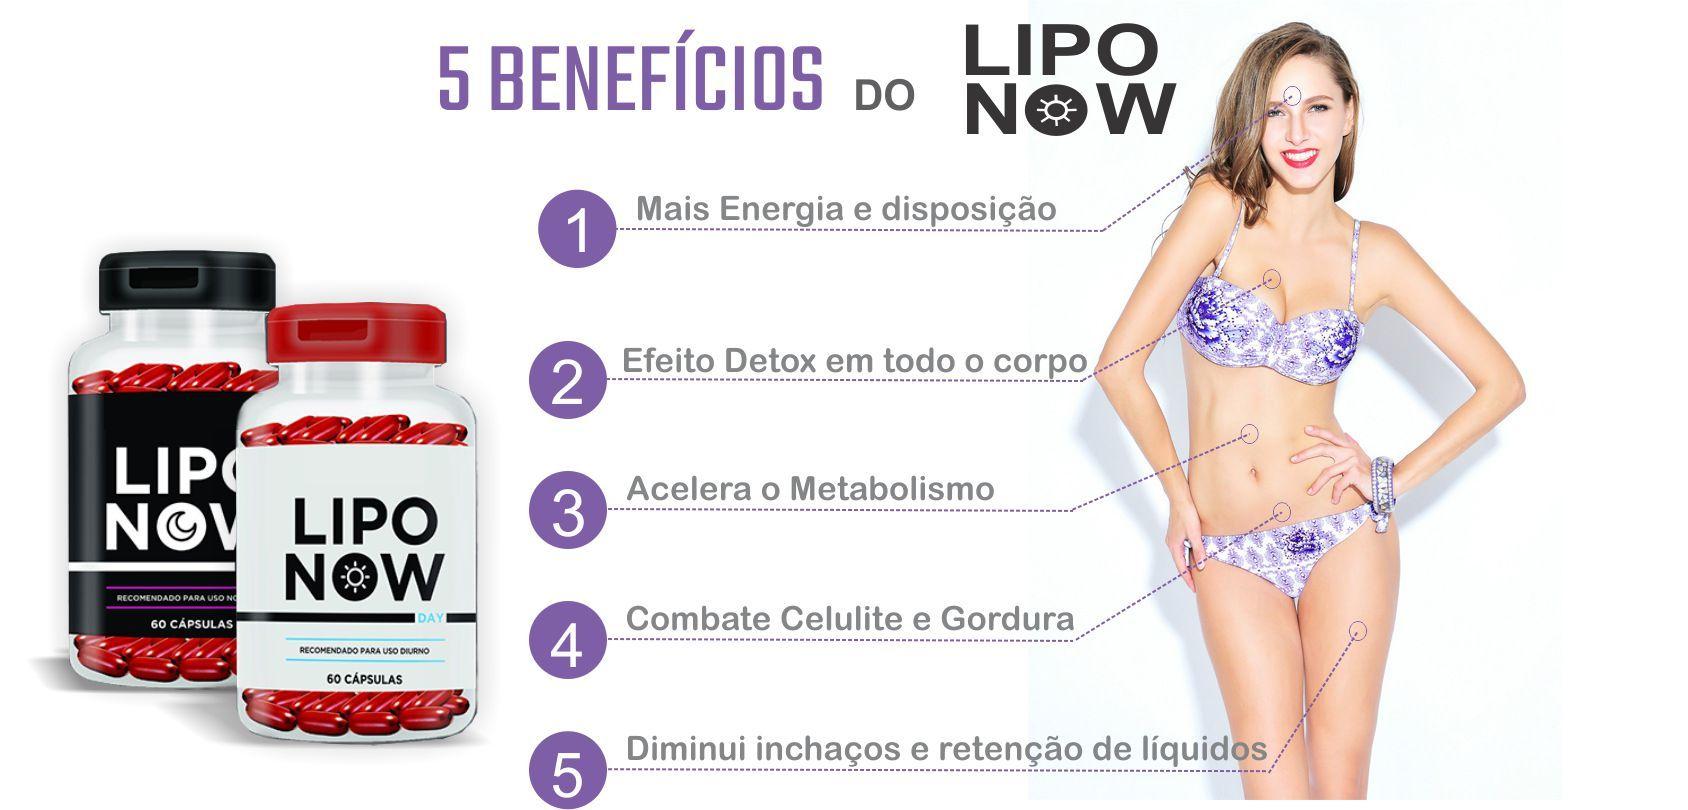 liponow